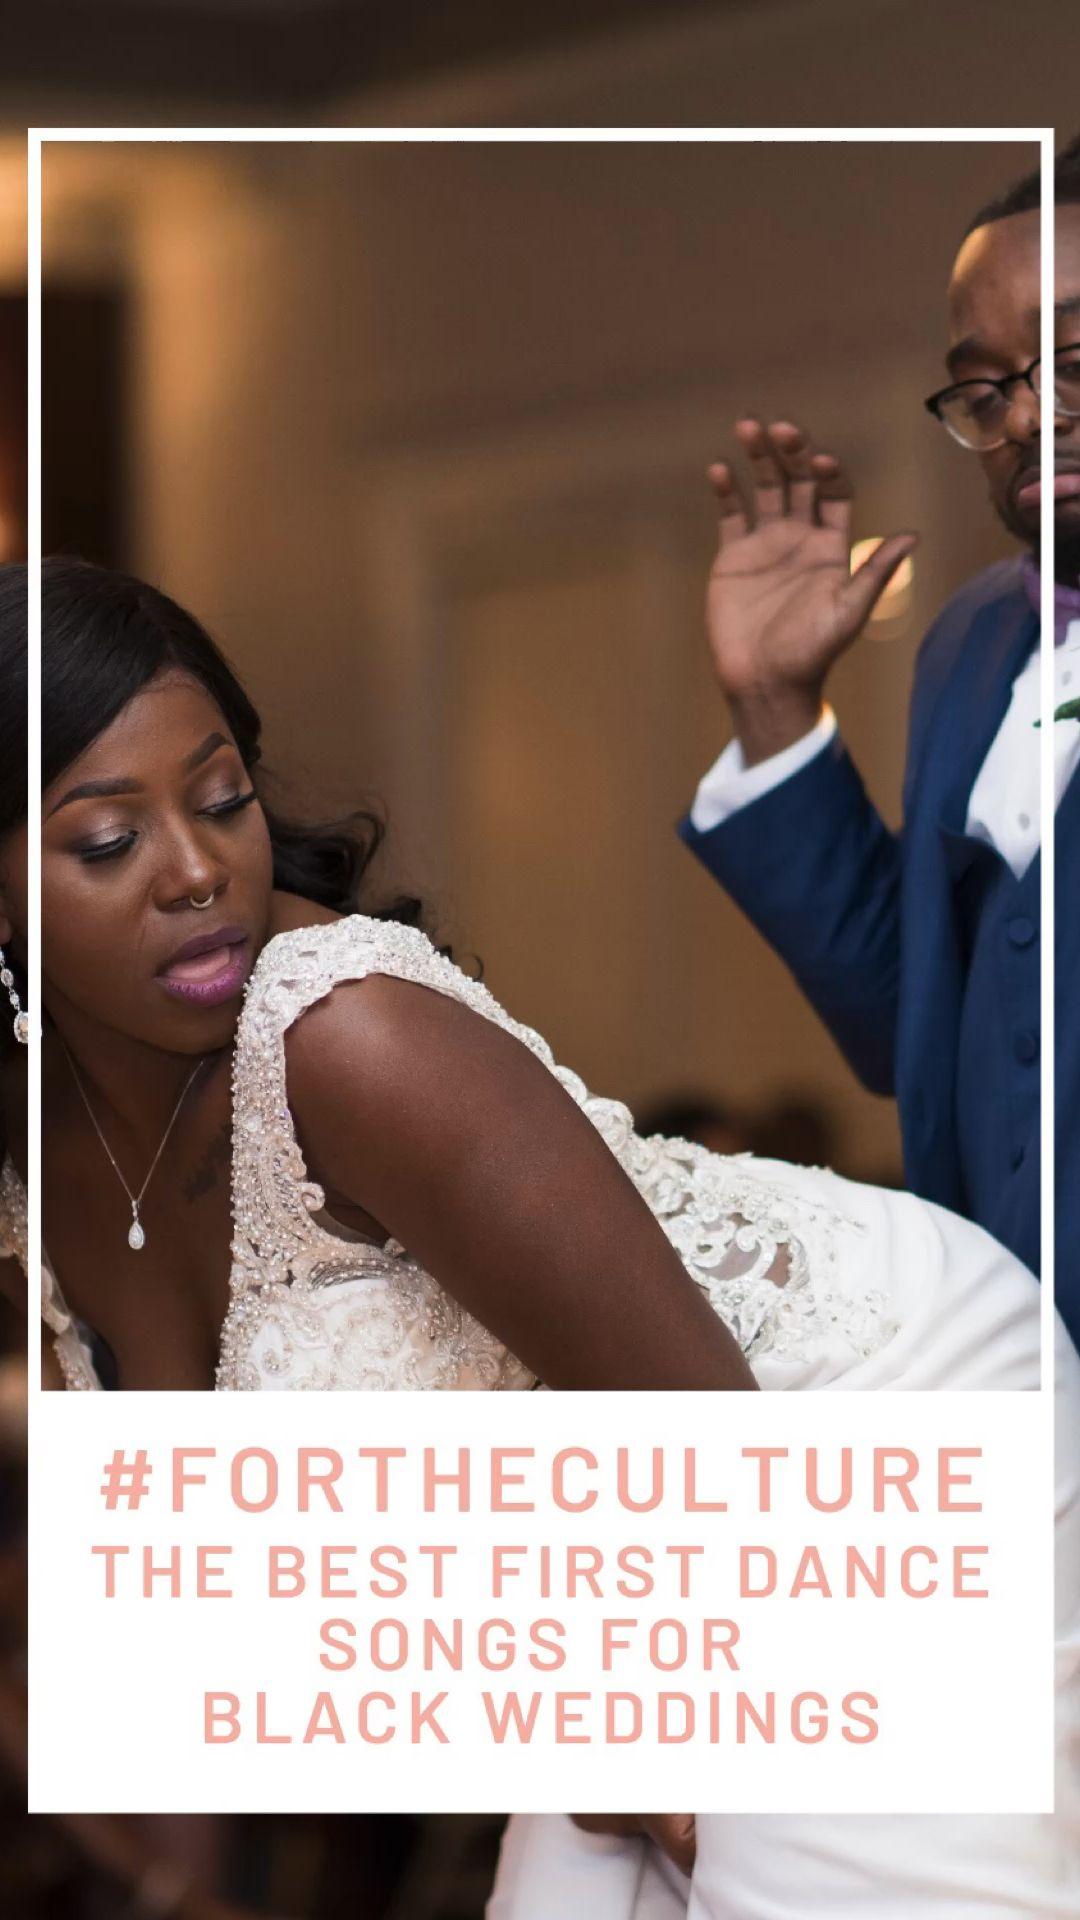 Best First Dance Songs for Black Weddings